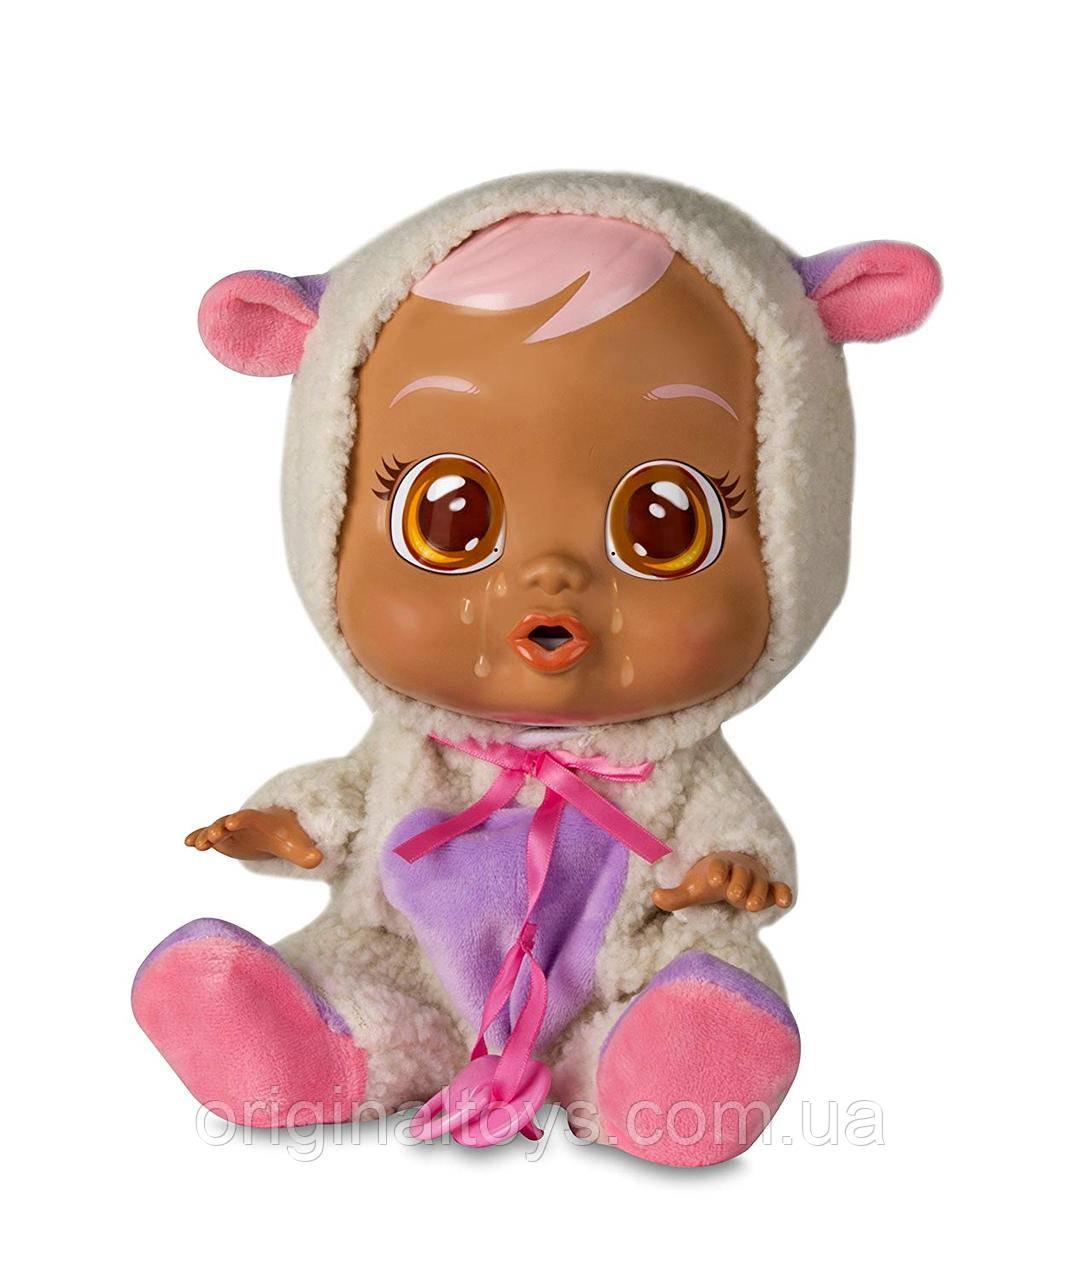 Інтерактивна лялька пупс Cry Babies Плакса Ламмі